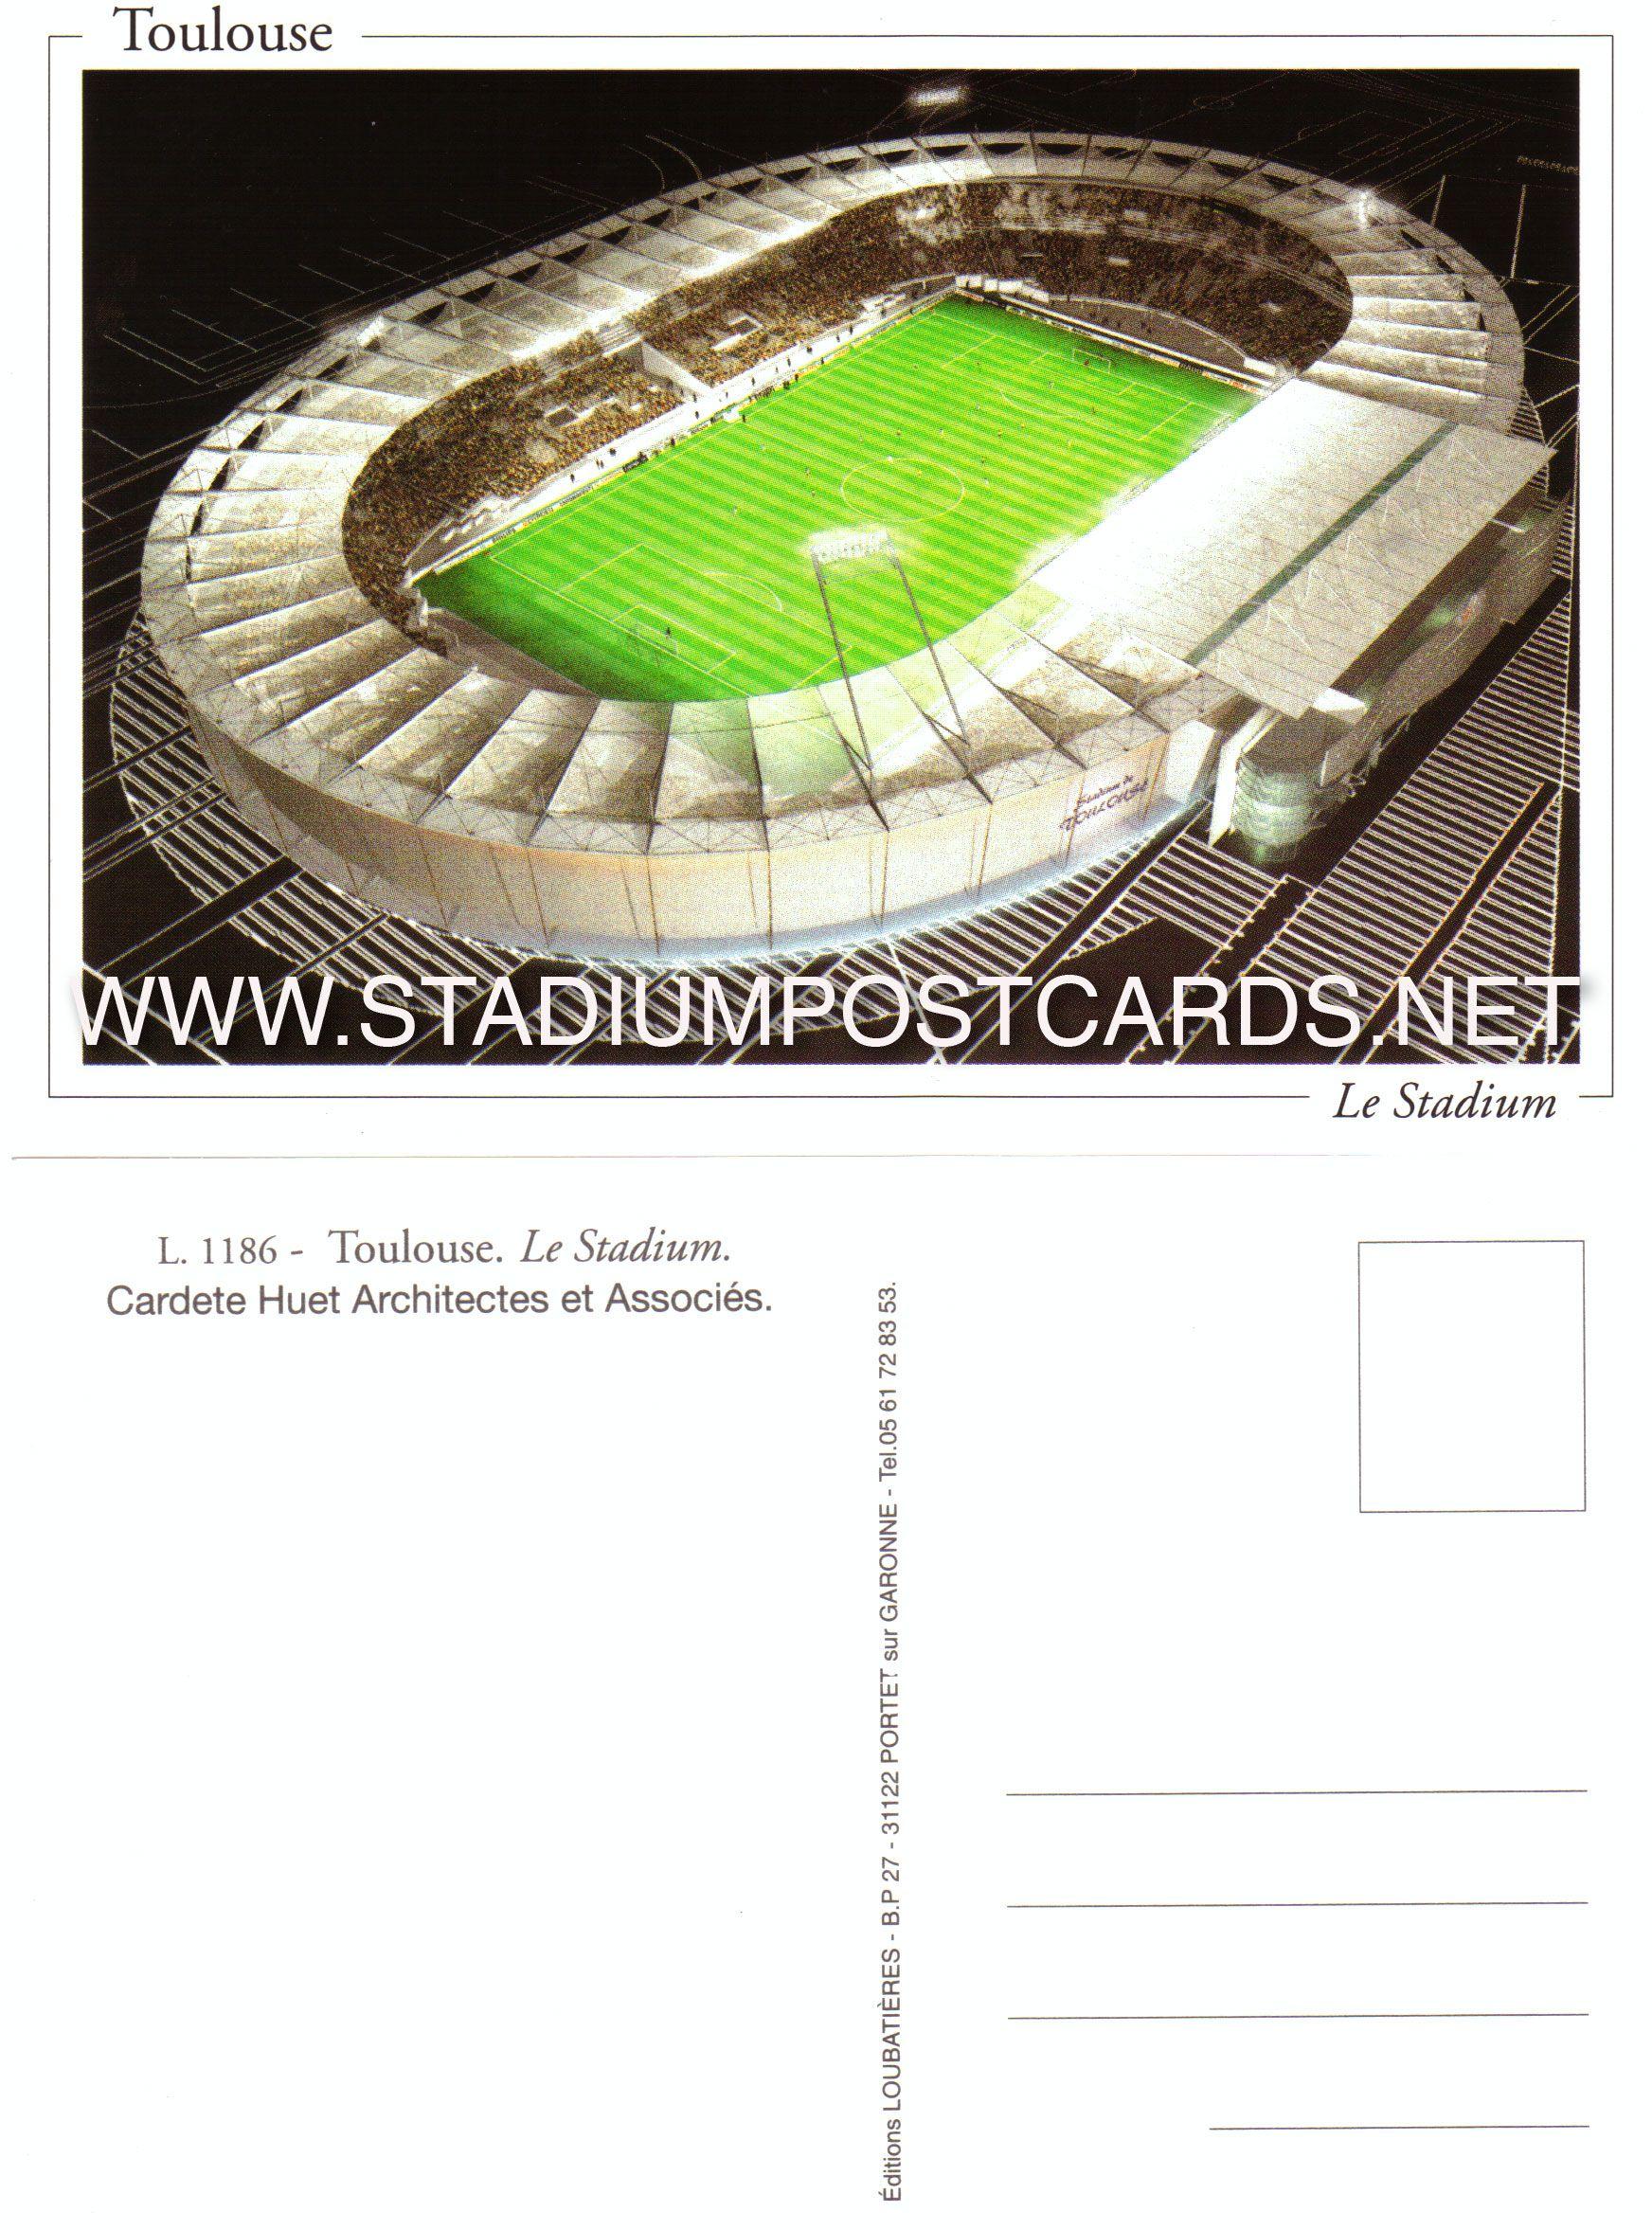 0 90 Code Fra 017 Toulouse Le Stadium Stadium Postcard